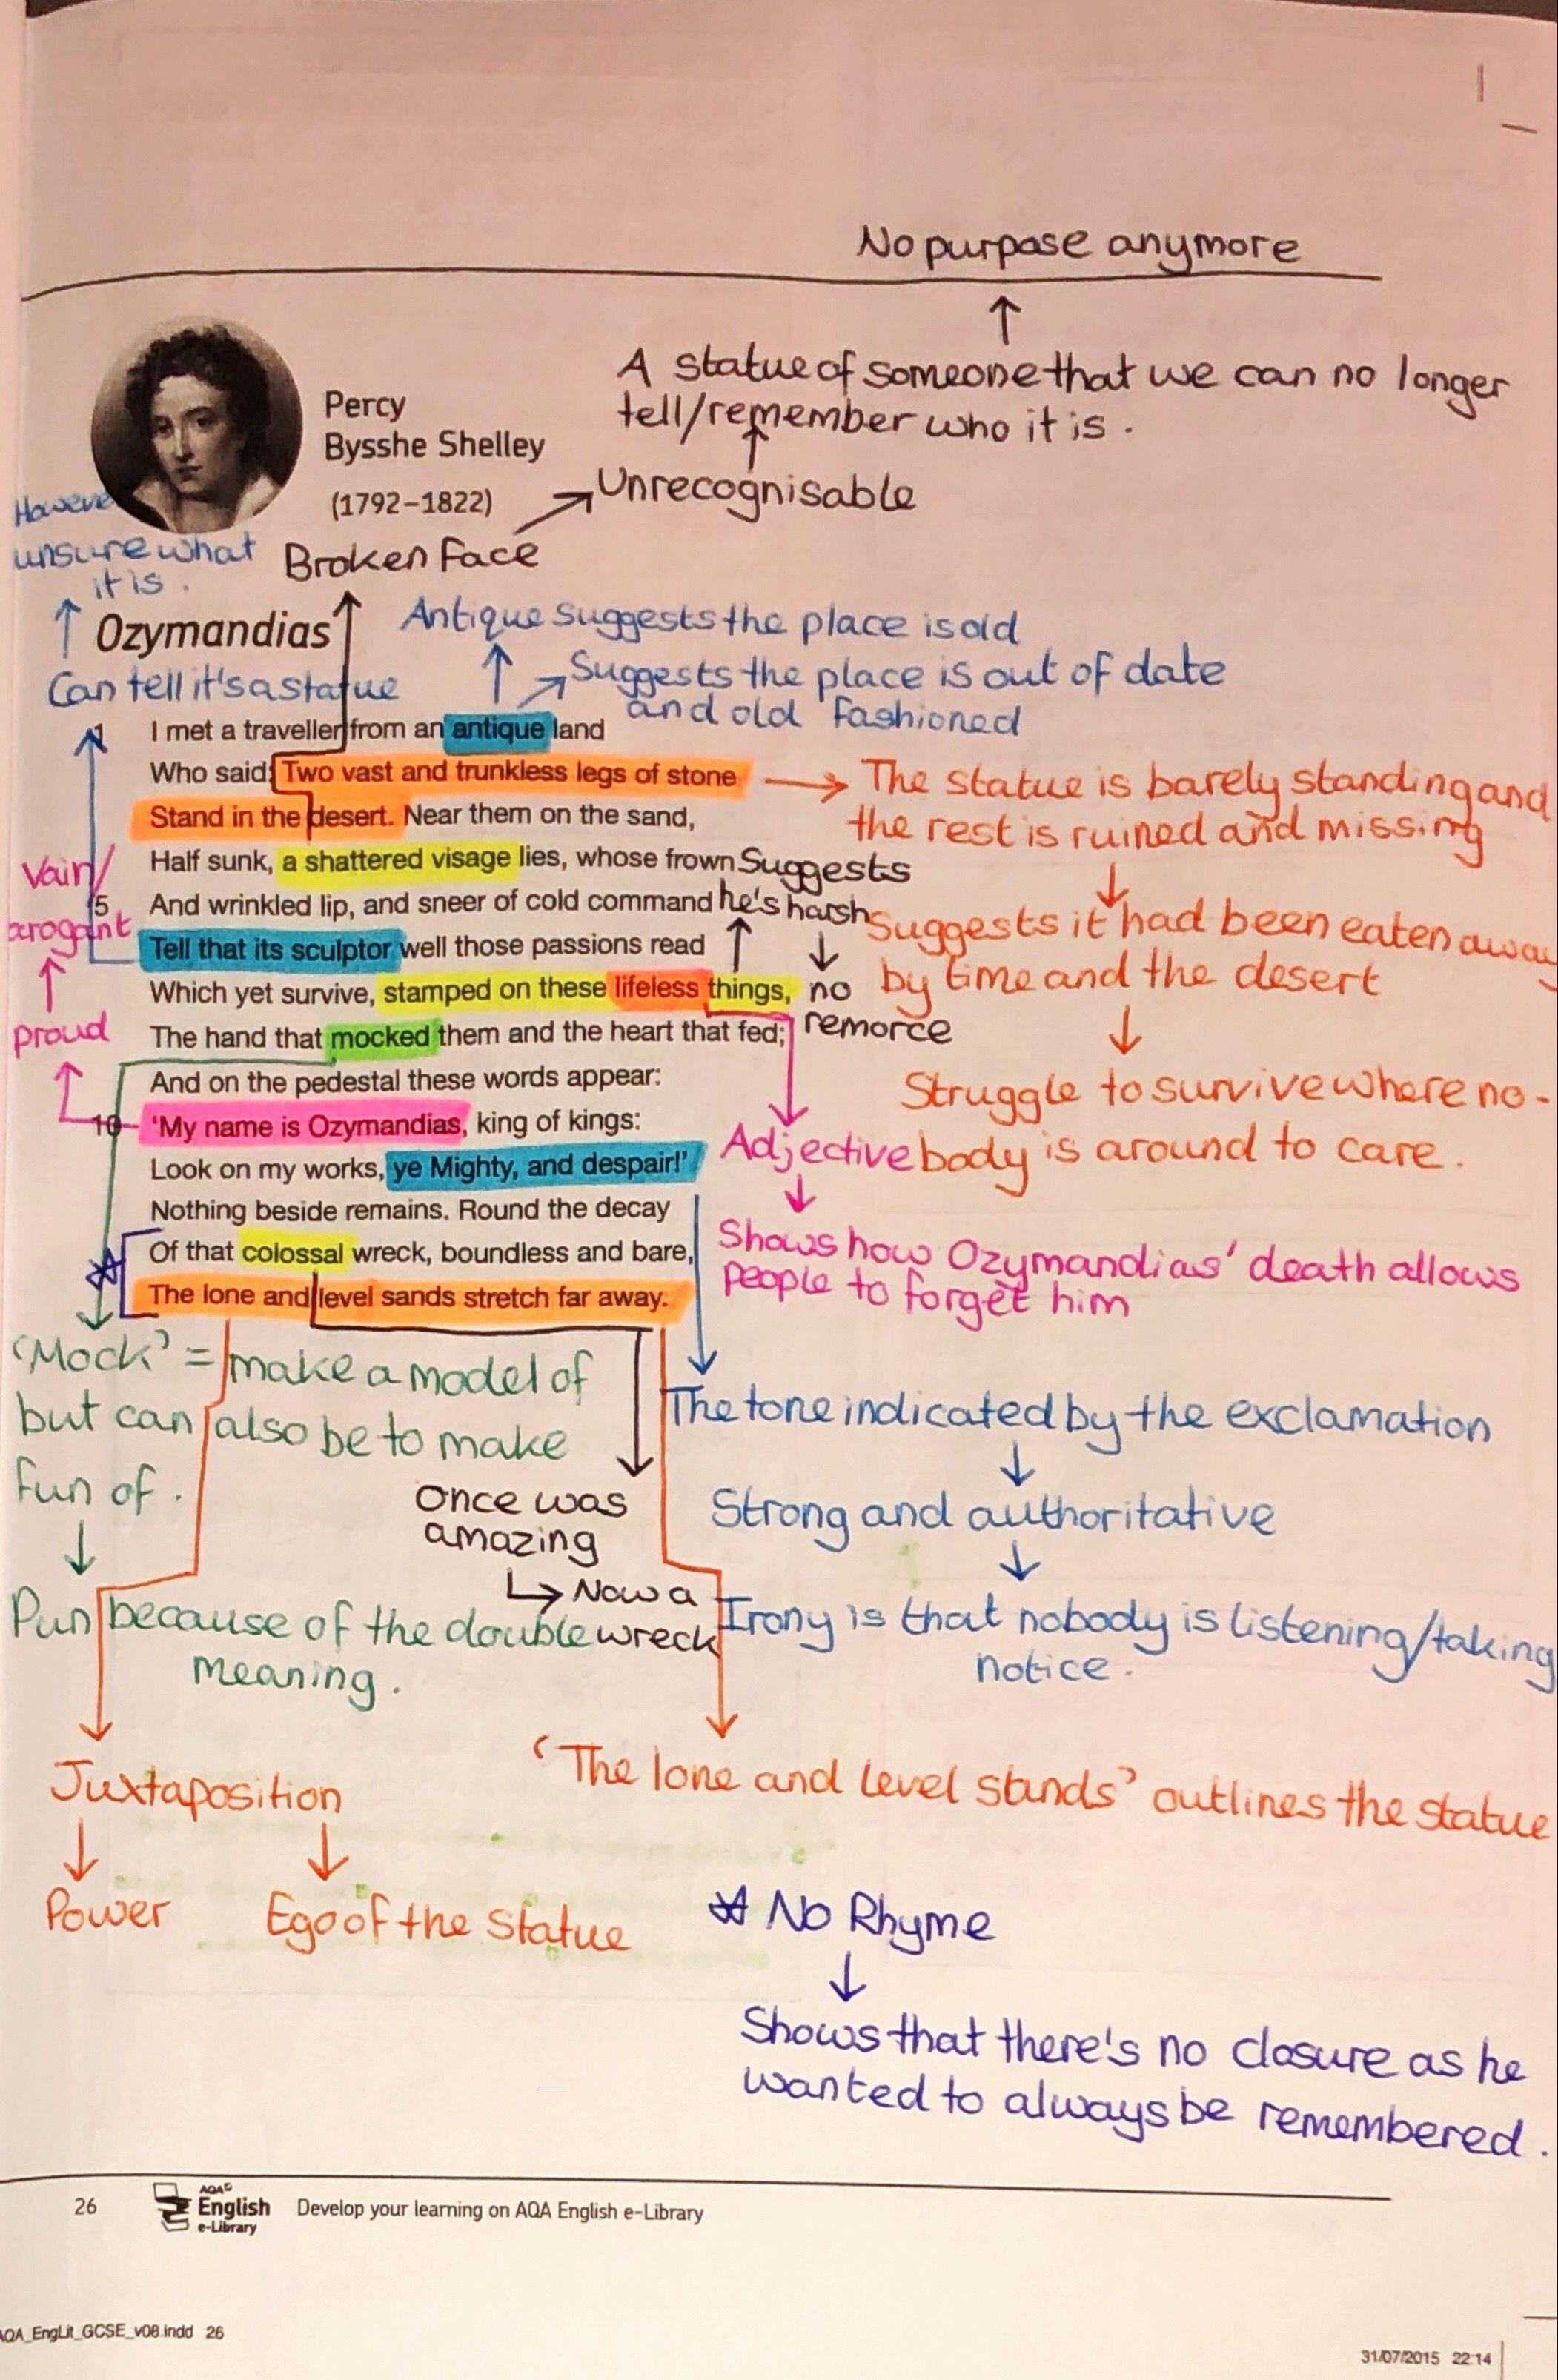 Ozymandia Annotation Gcse Revision Poem Analysi Poems Theme Of The By Pb Shelley